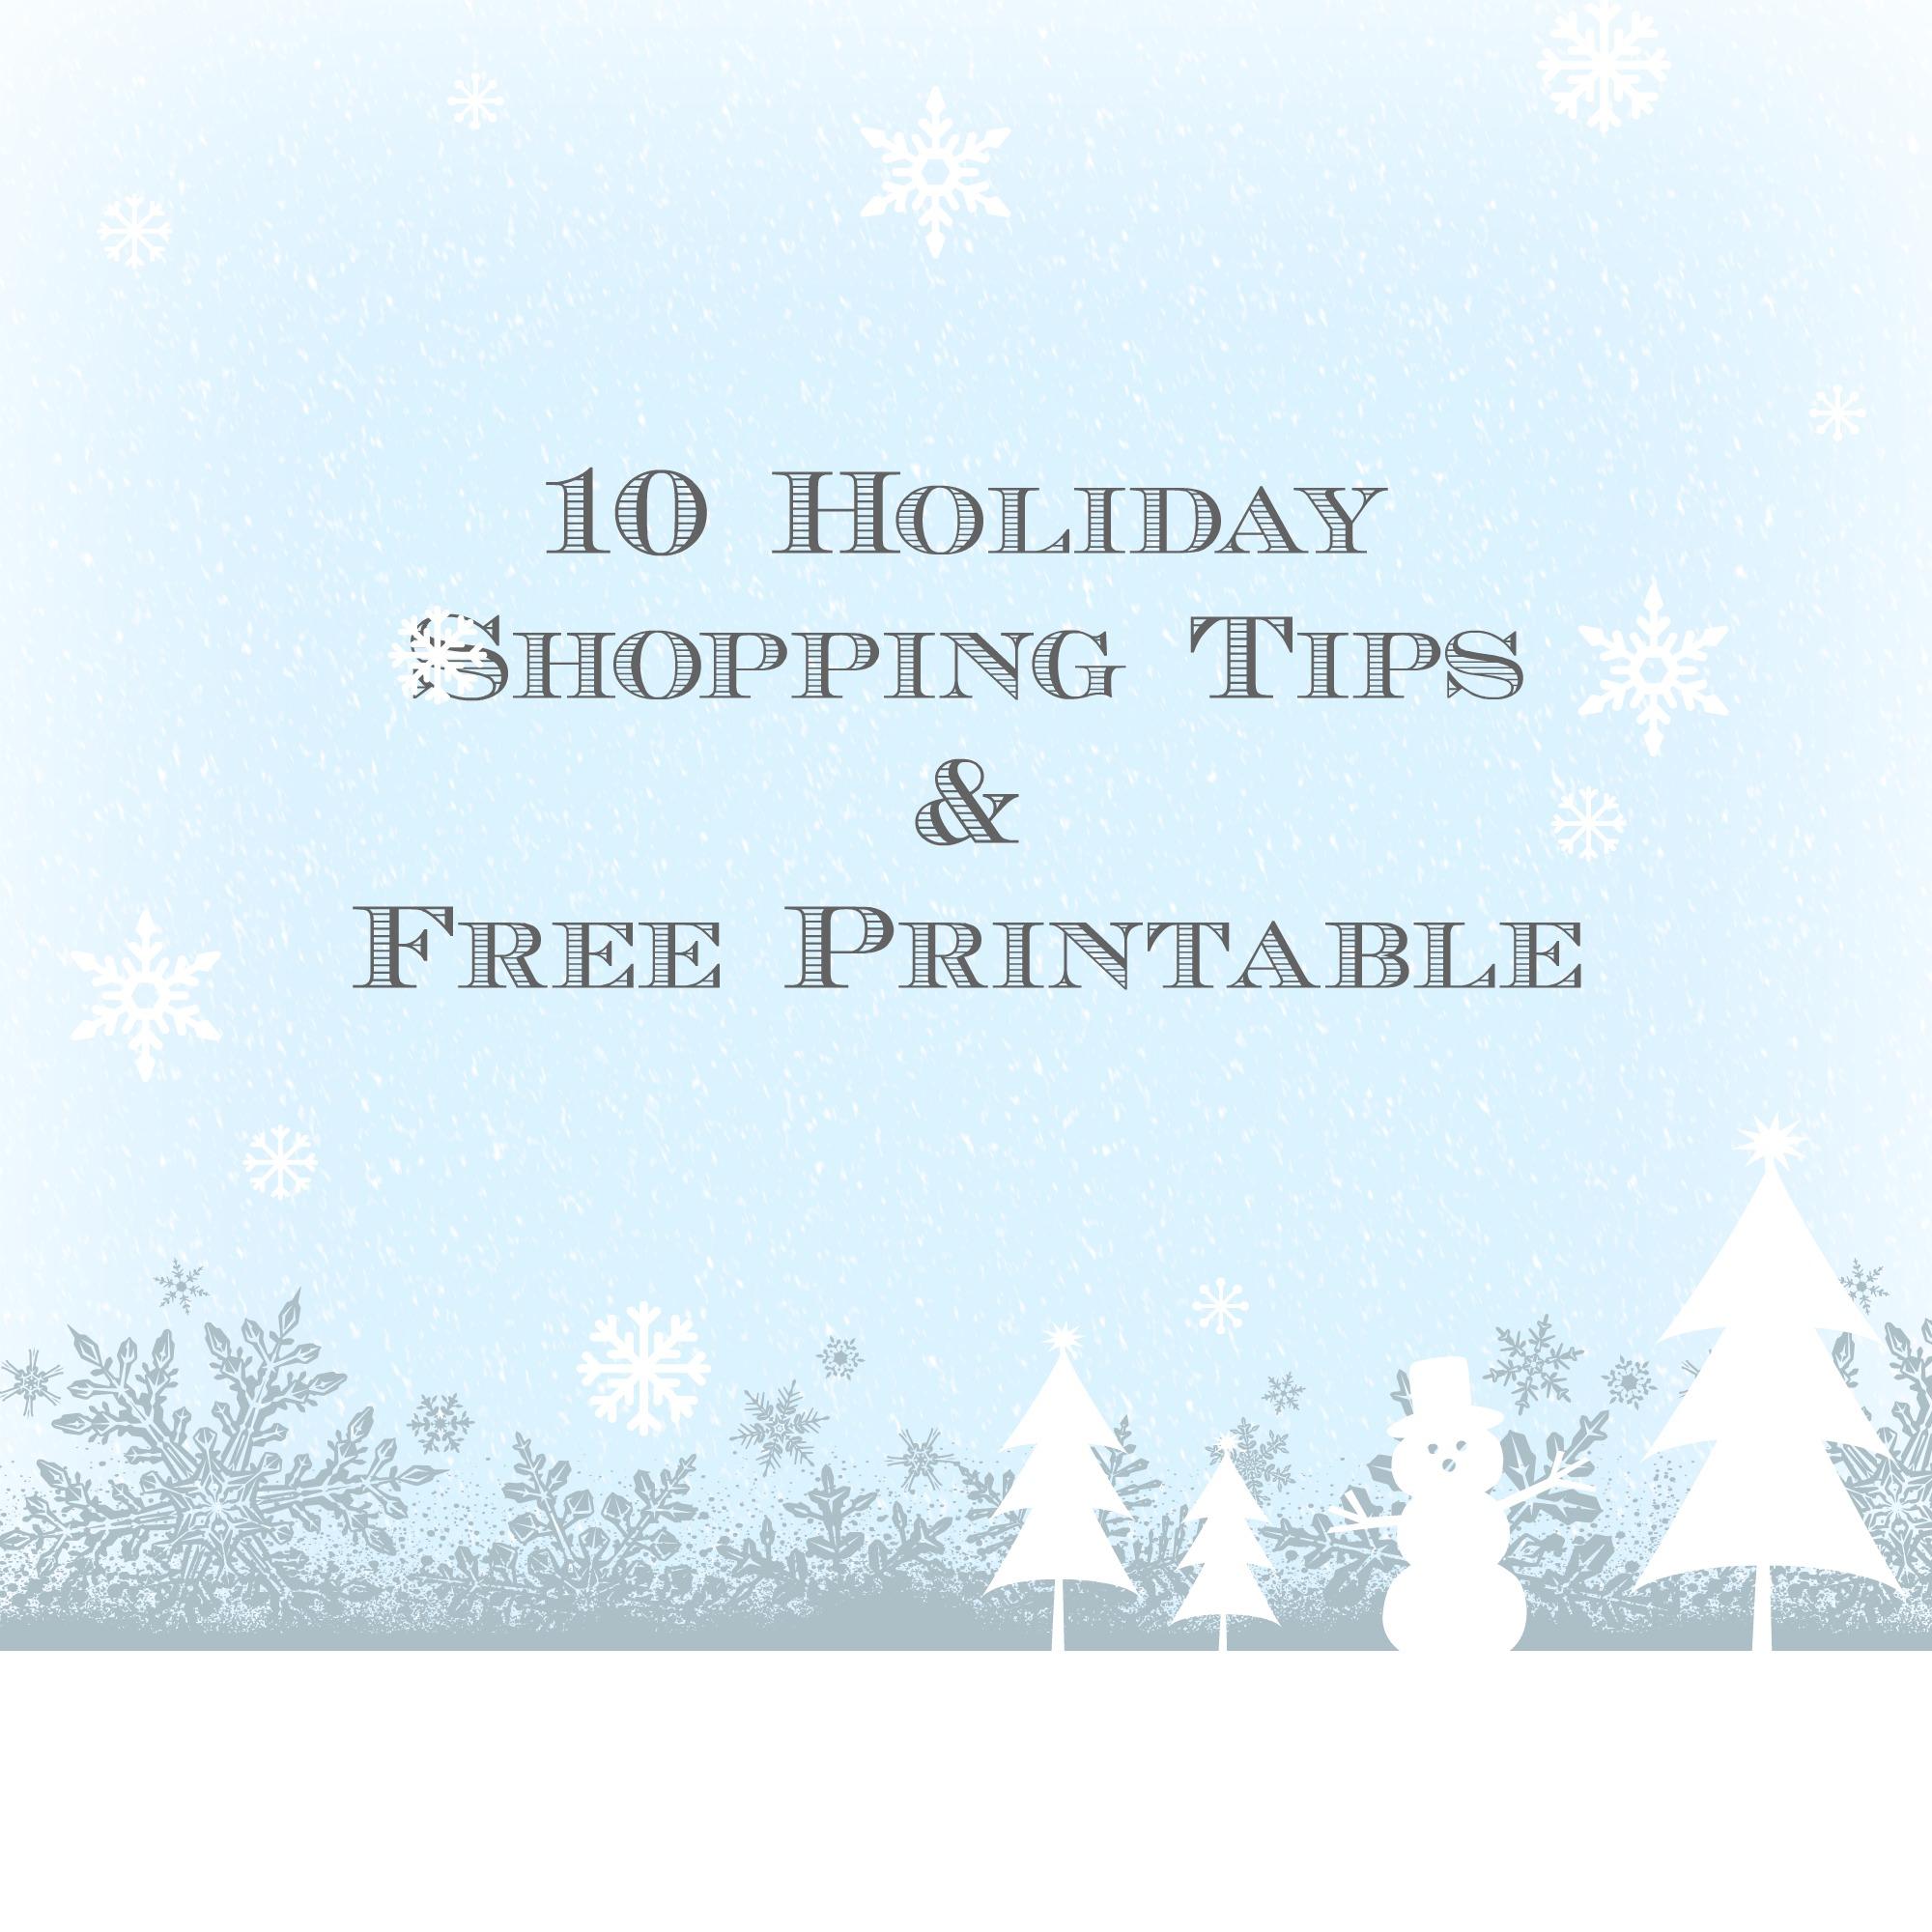 10 Holiday Shopping Tips and Printable